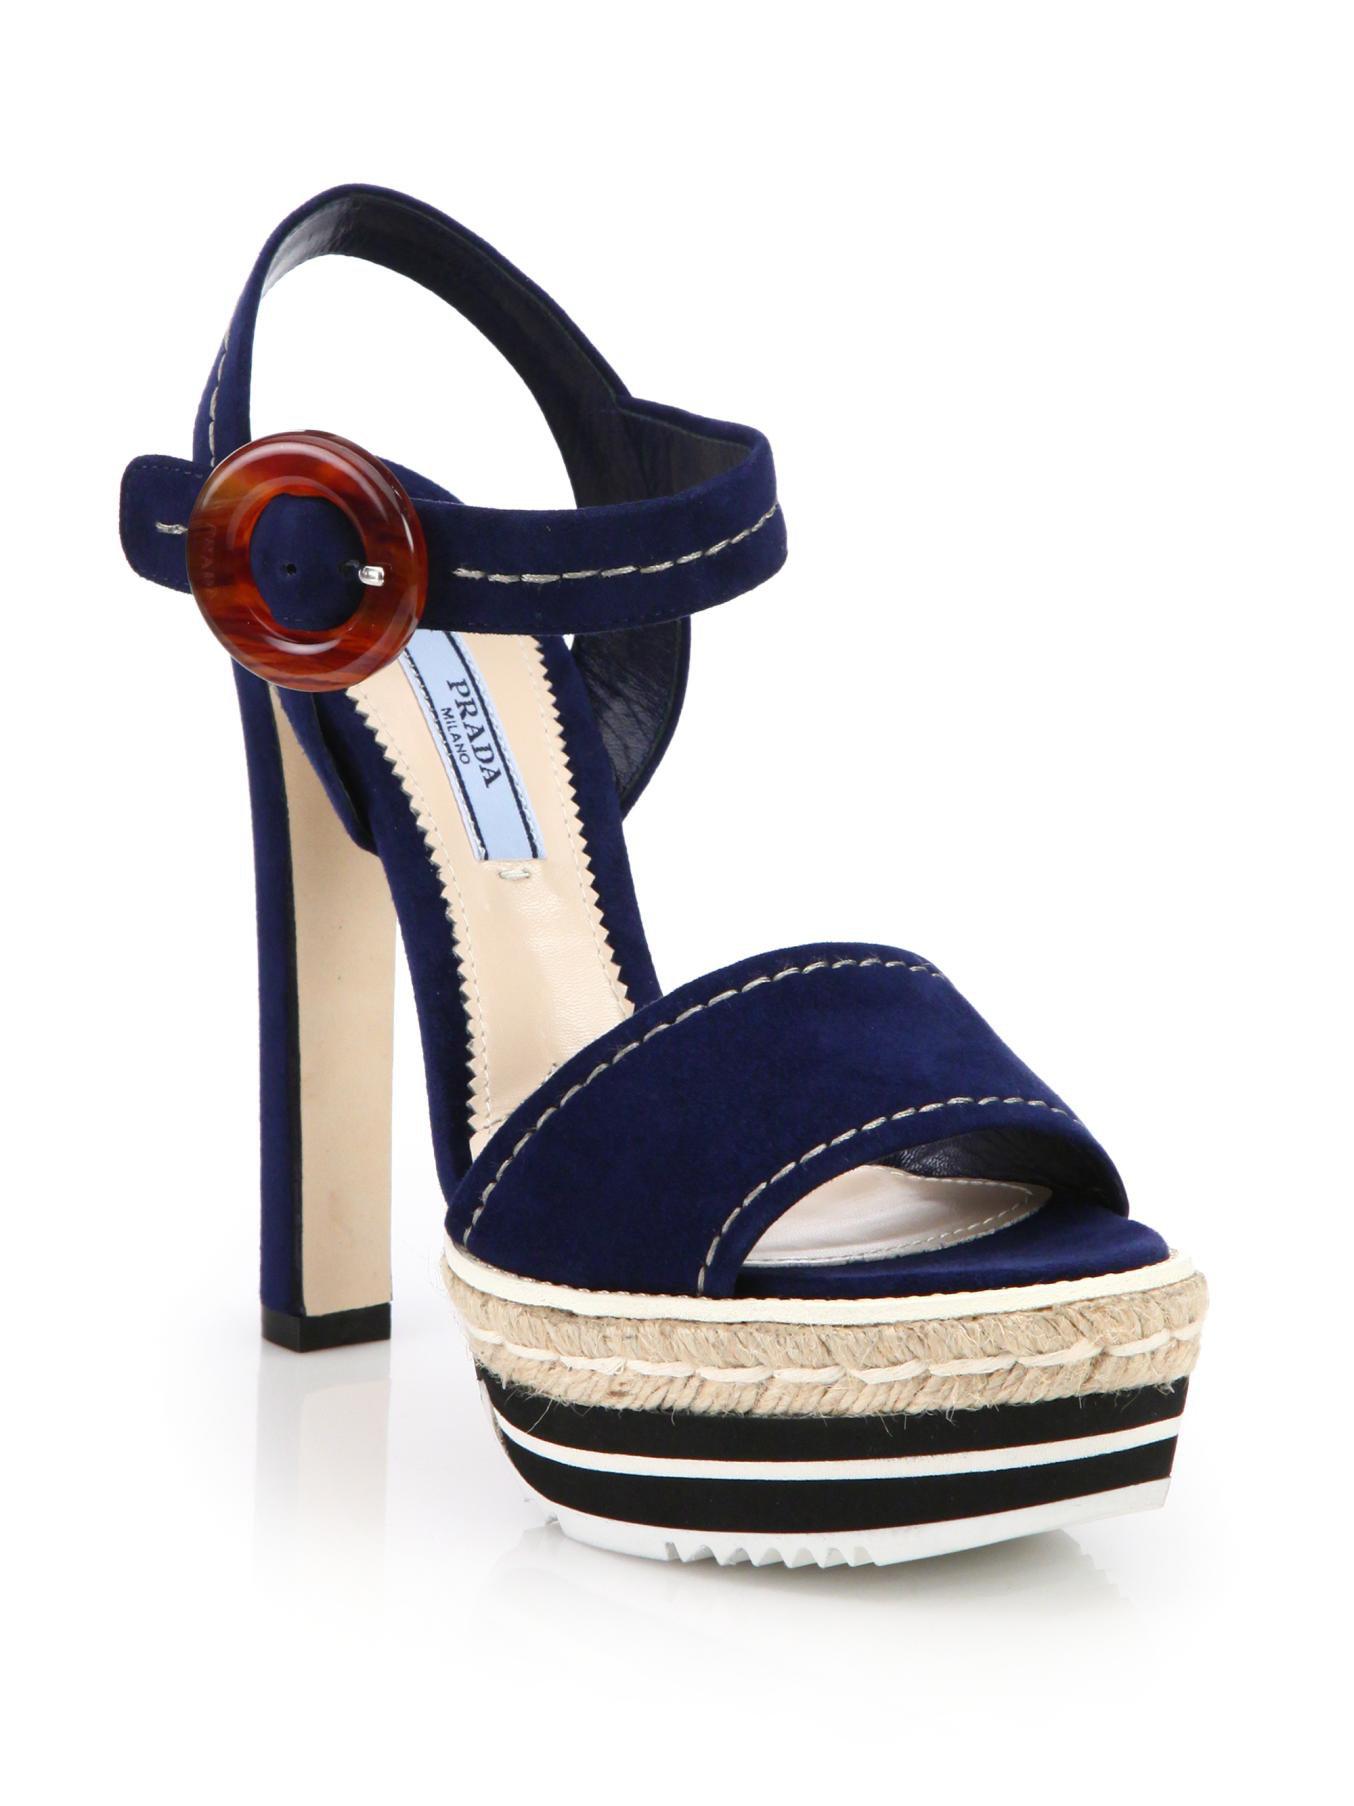 6990f44a65cf Prada Strappy Suede Platform Sandals